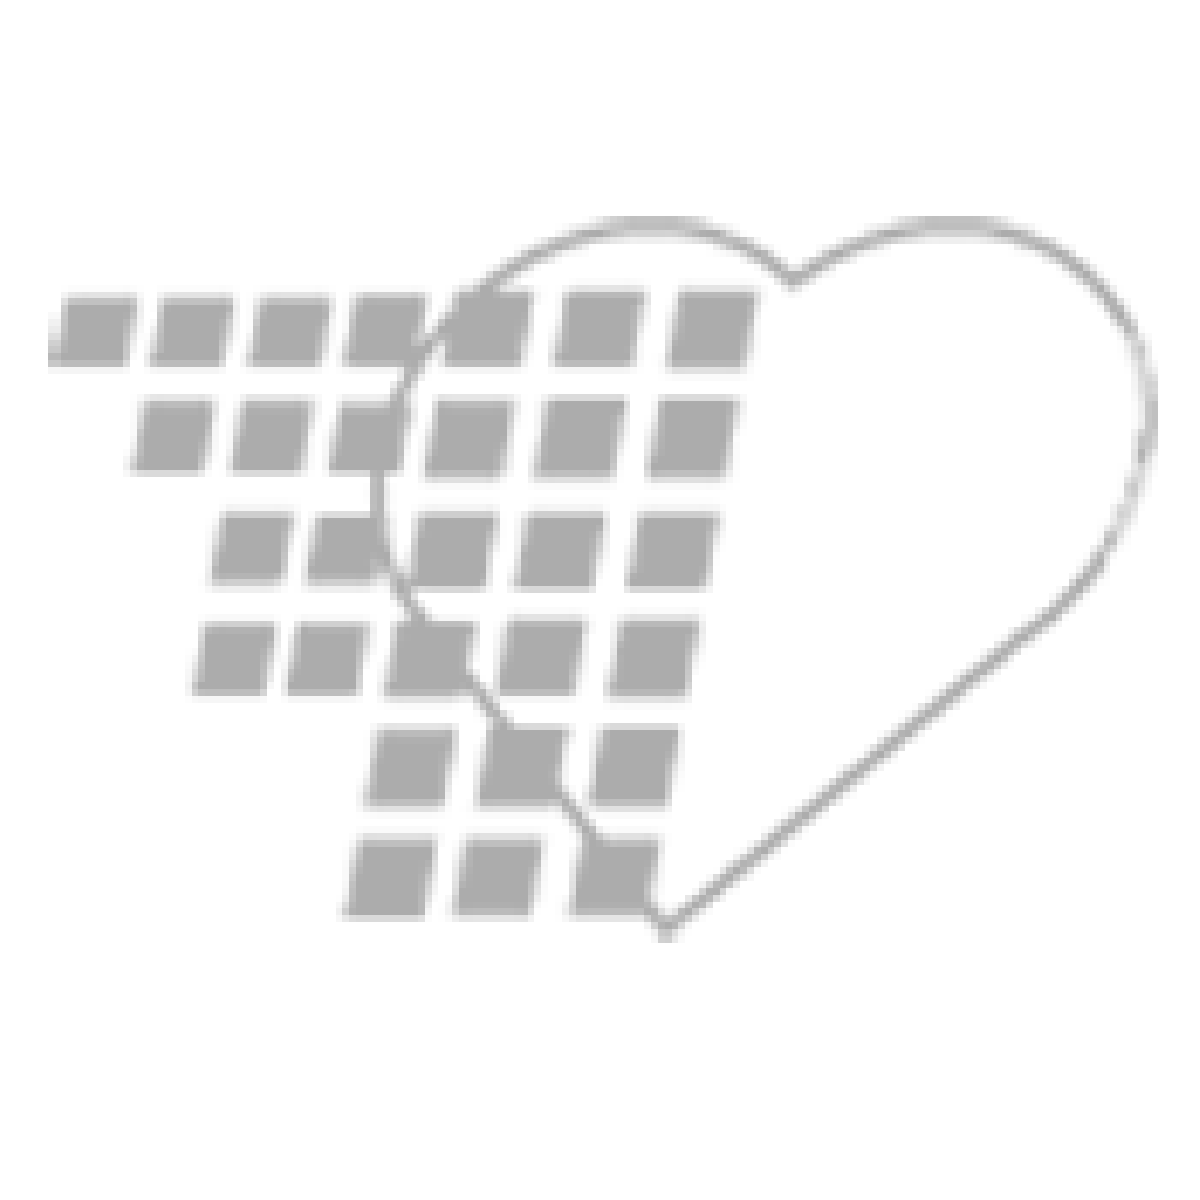 02-43-9000 Three-Channel Wide-Screen ECG Interpretation